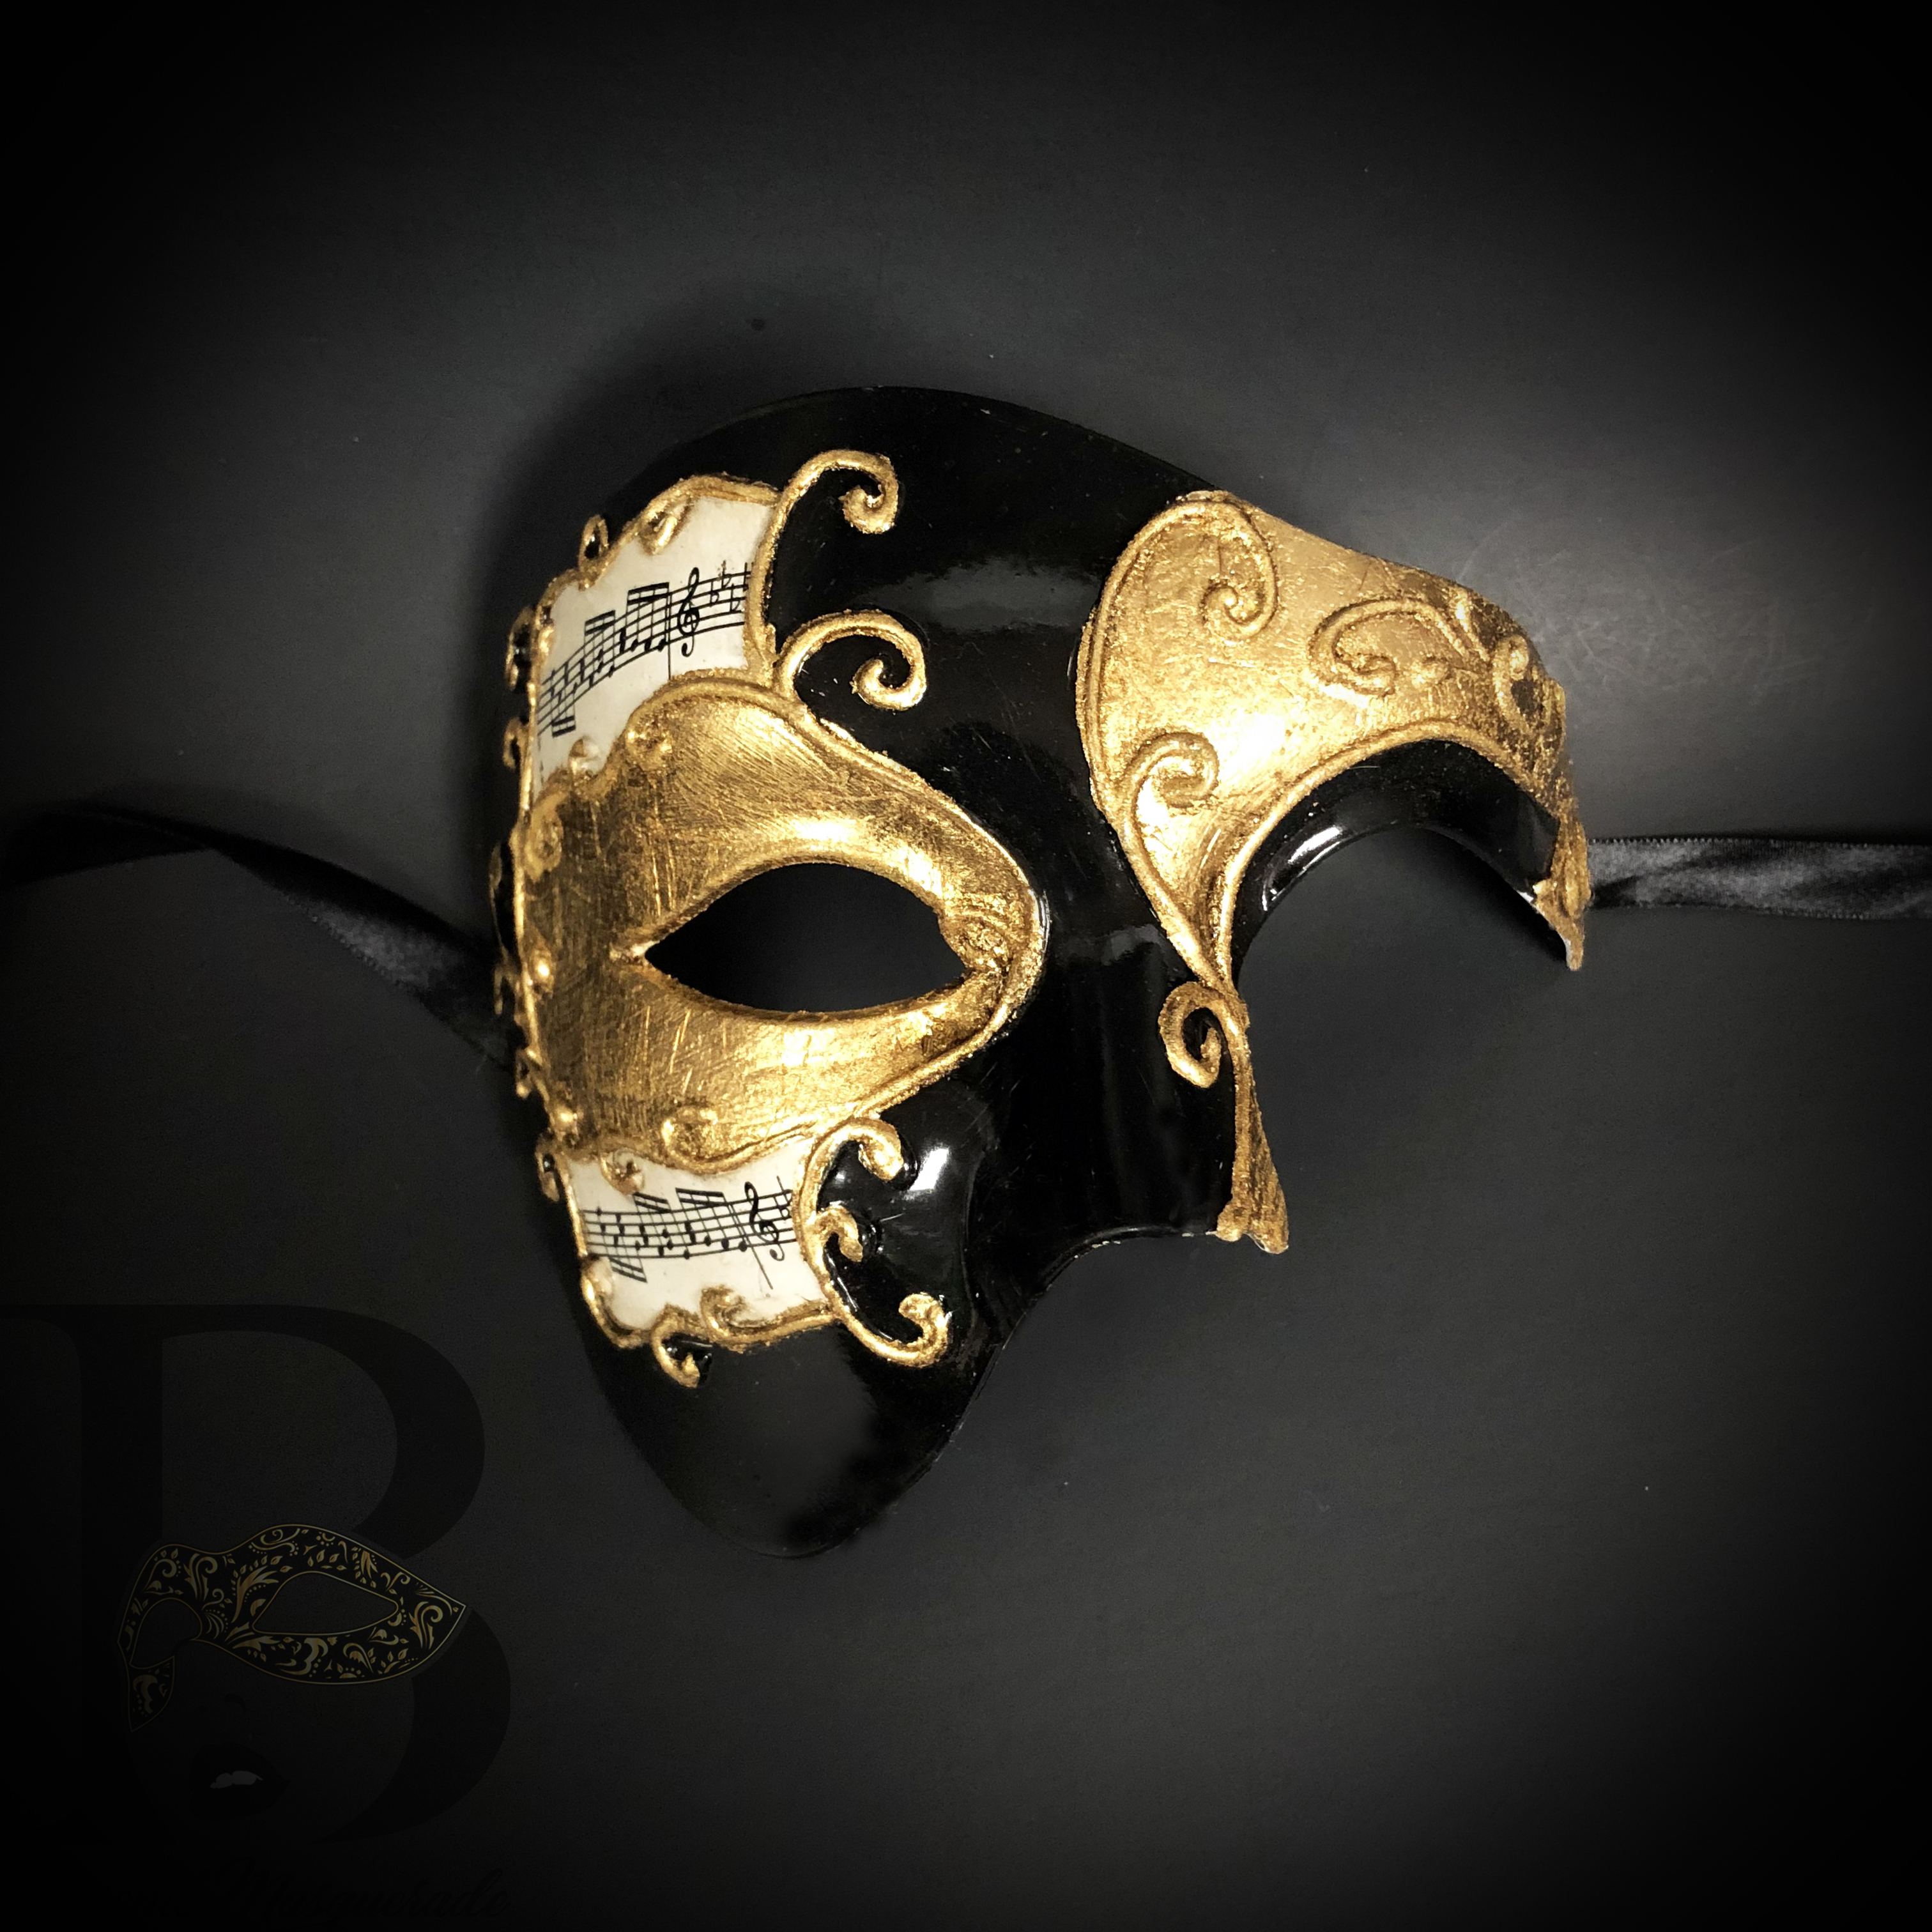 Gold Mask Mens Masquerade Mask Mardi Gras Mask Masquerade Mask Men Masquerade Mask Plague Doctor Mask